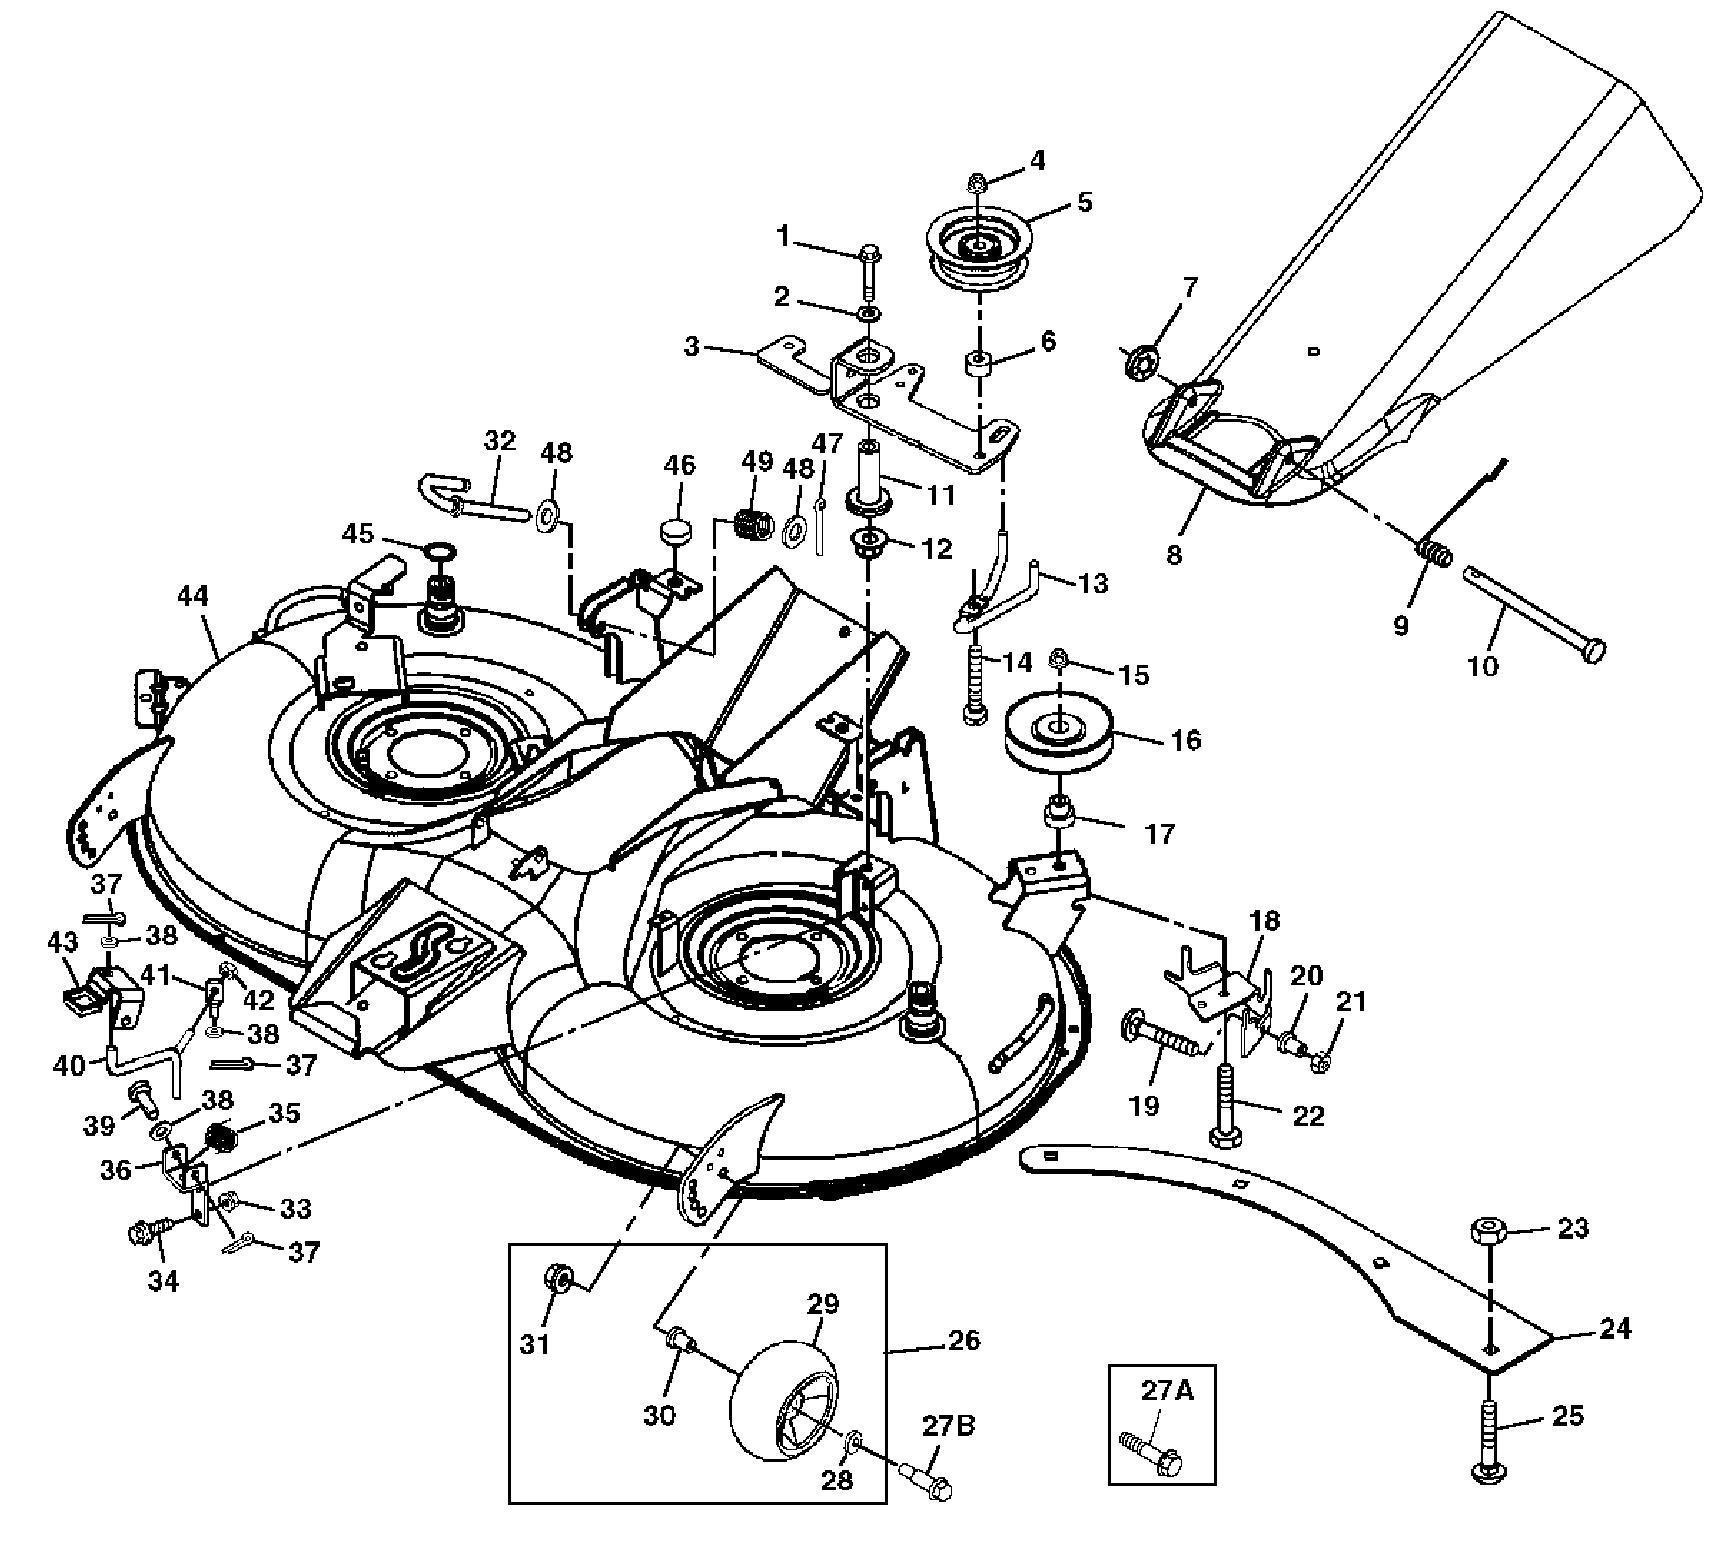 Mower parts gallery